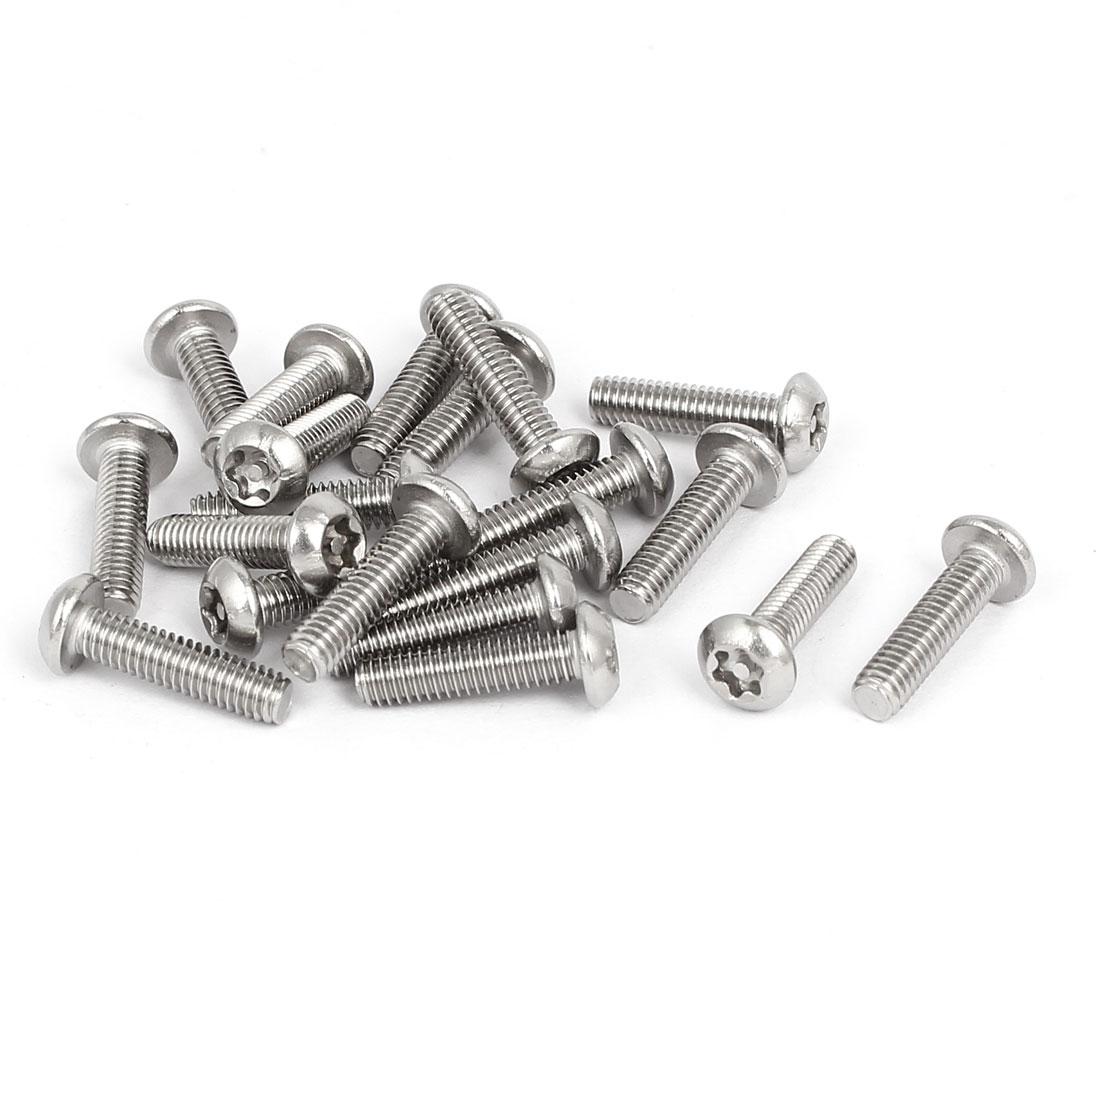 M4x16mm 304 Stainless Steel Button Head Torx Tamper Resistant Screws 20pcs